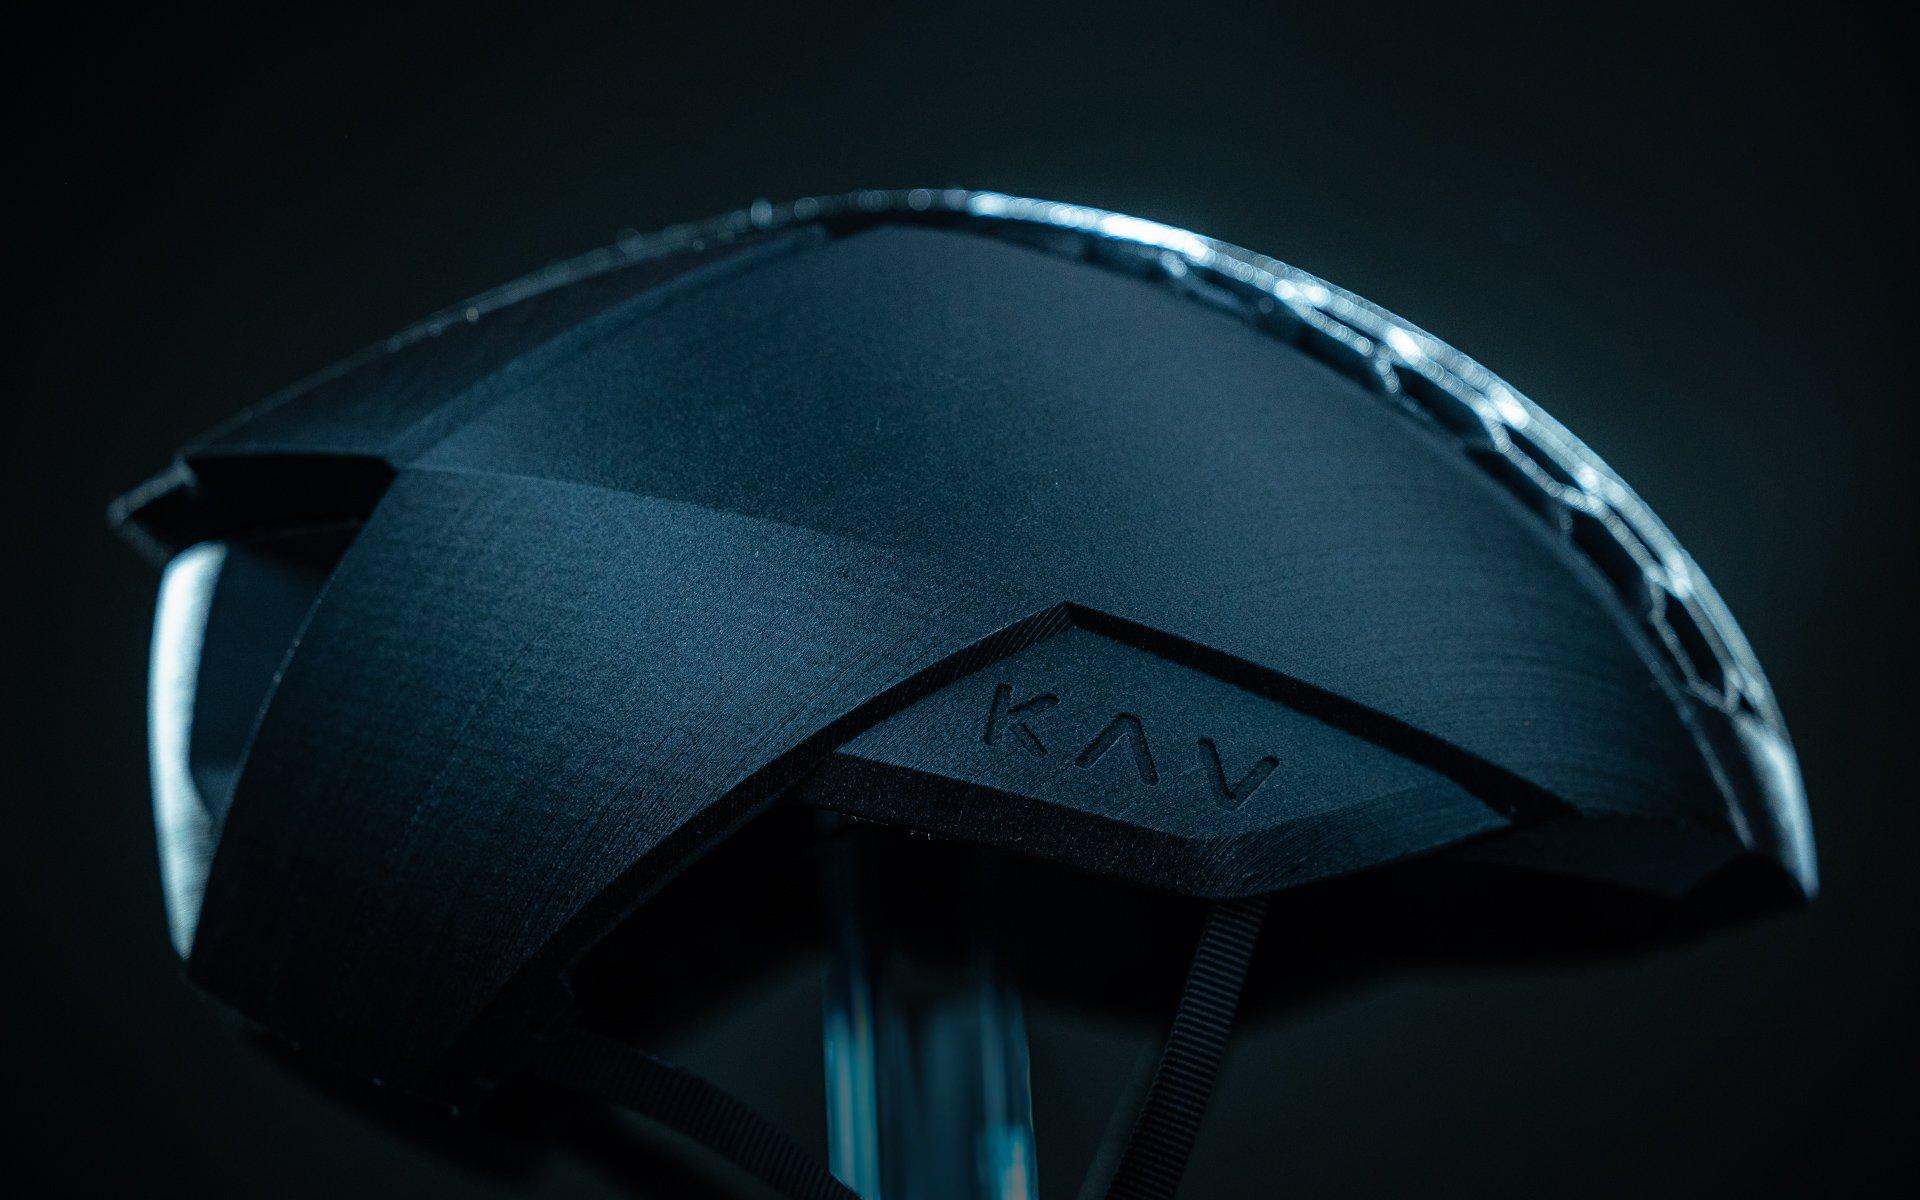 KAV LAUNCHES 3D PRINTED HELMET